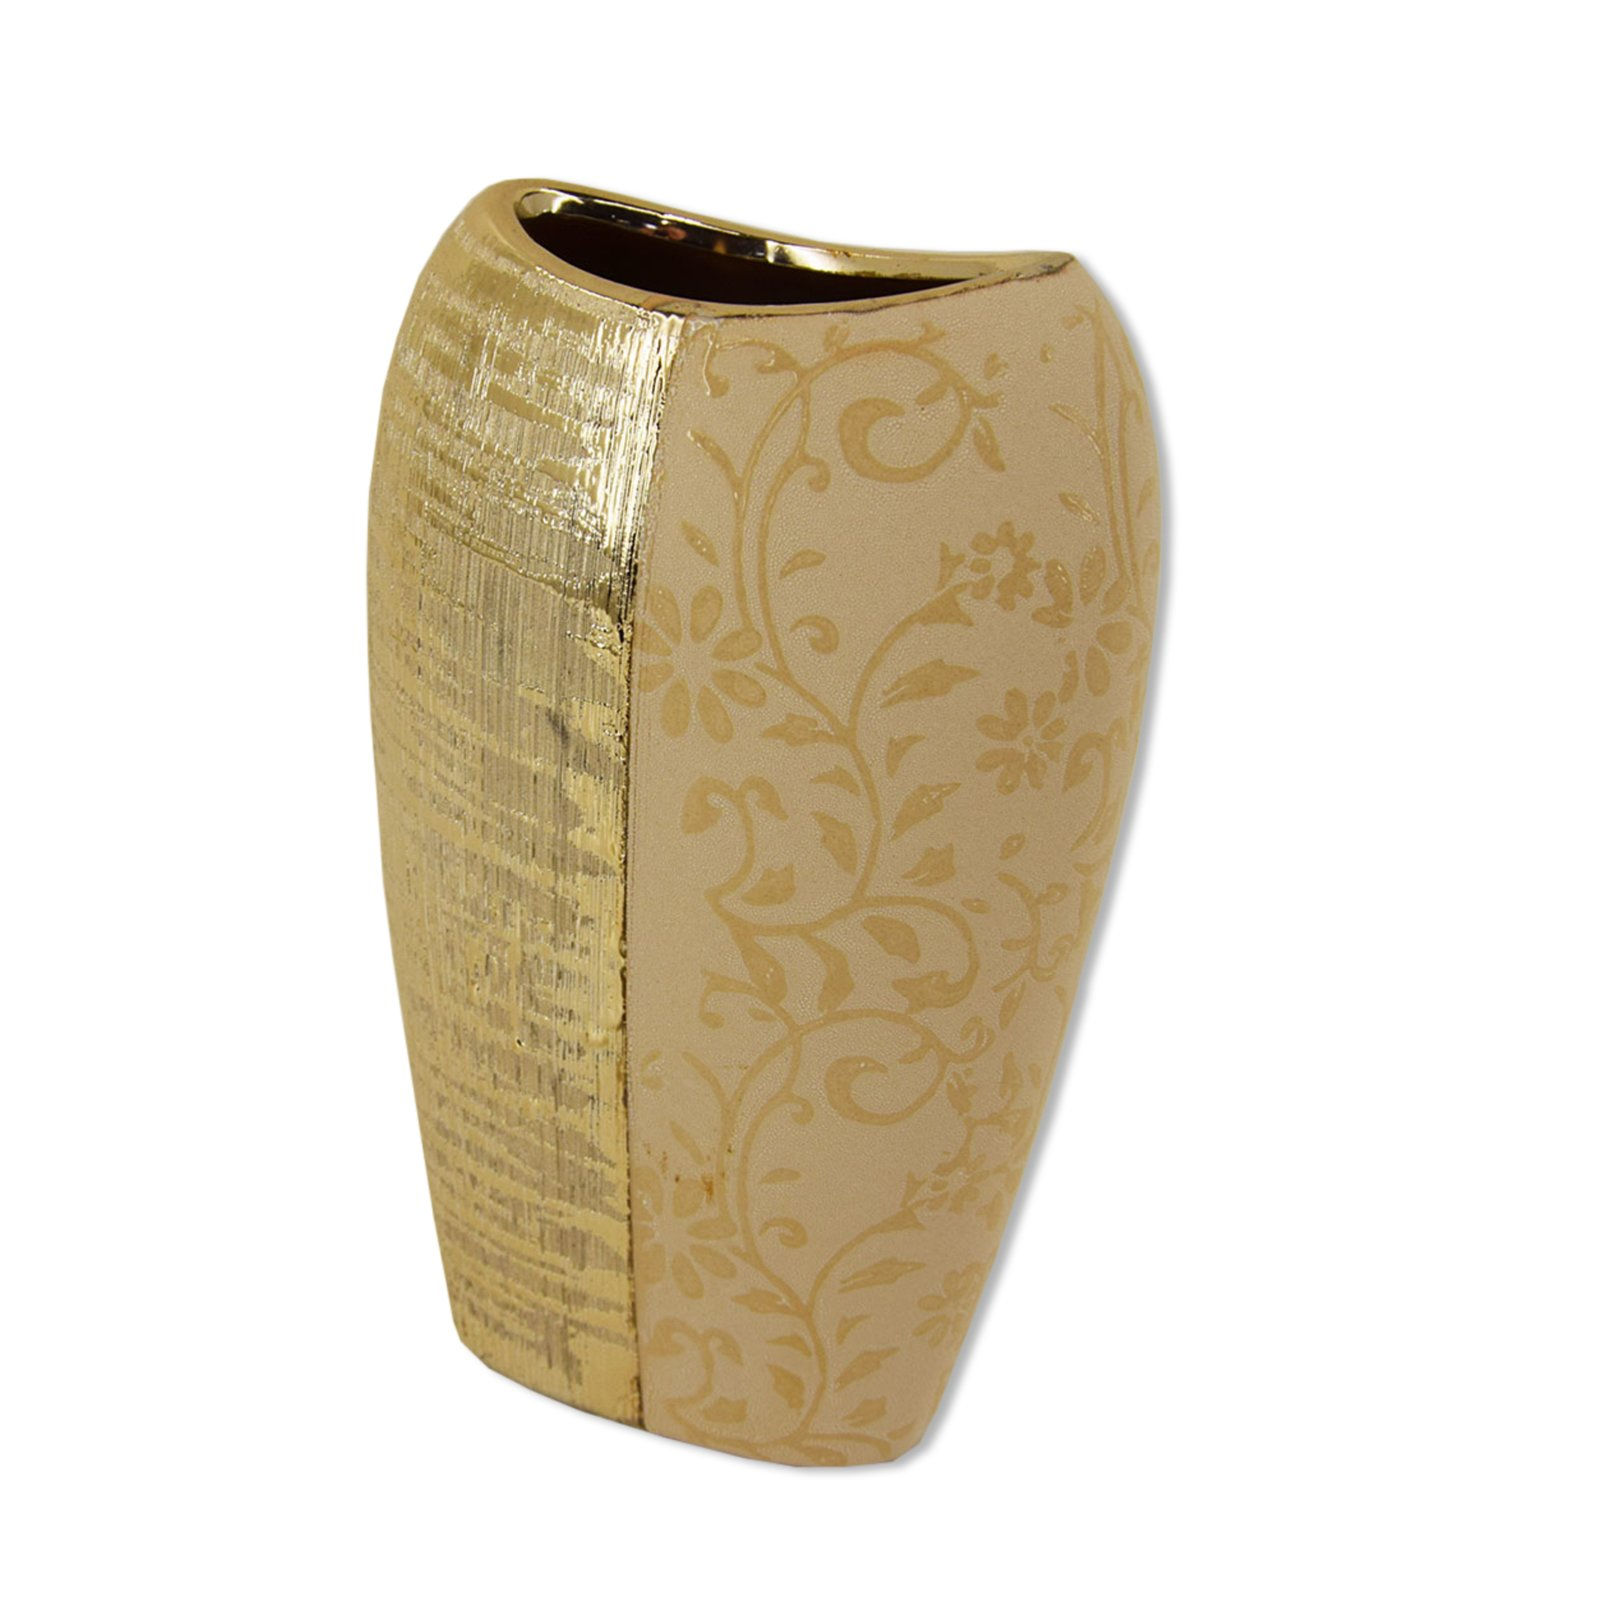 roller vase gold keramik mit blumendekor 22 cm hoch ebay. Black Bedroom Furniture Sets. Home Design Ideas